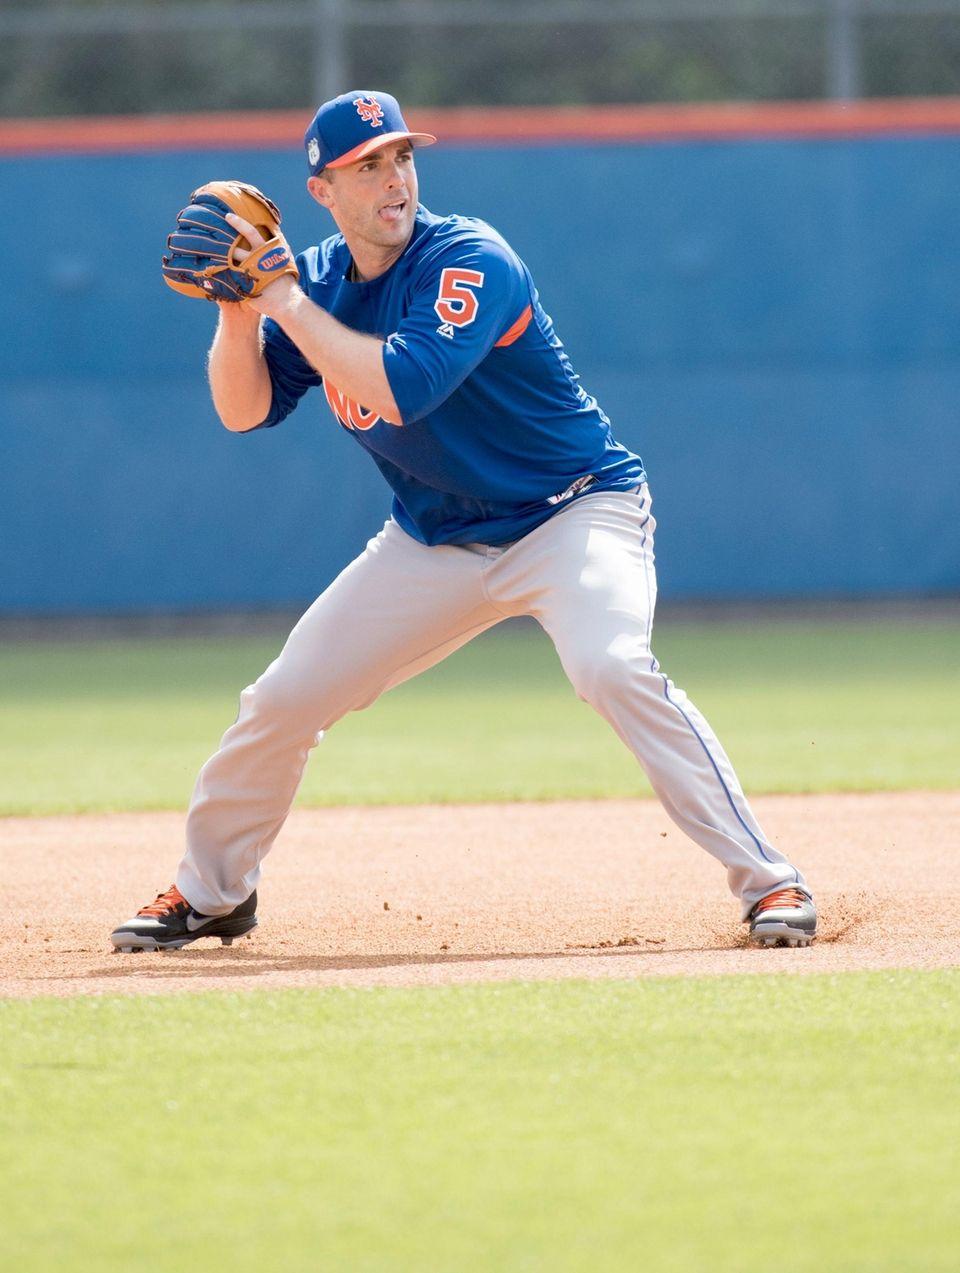 Mets third baseman David Wright prepares to throw